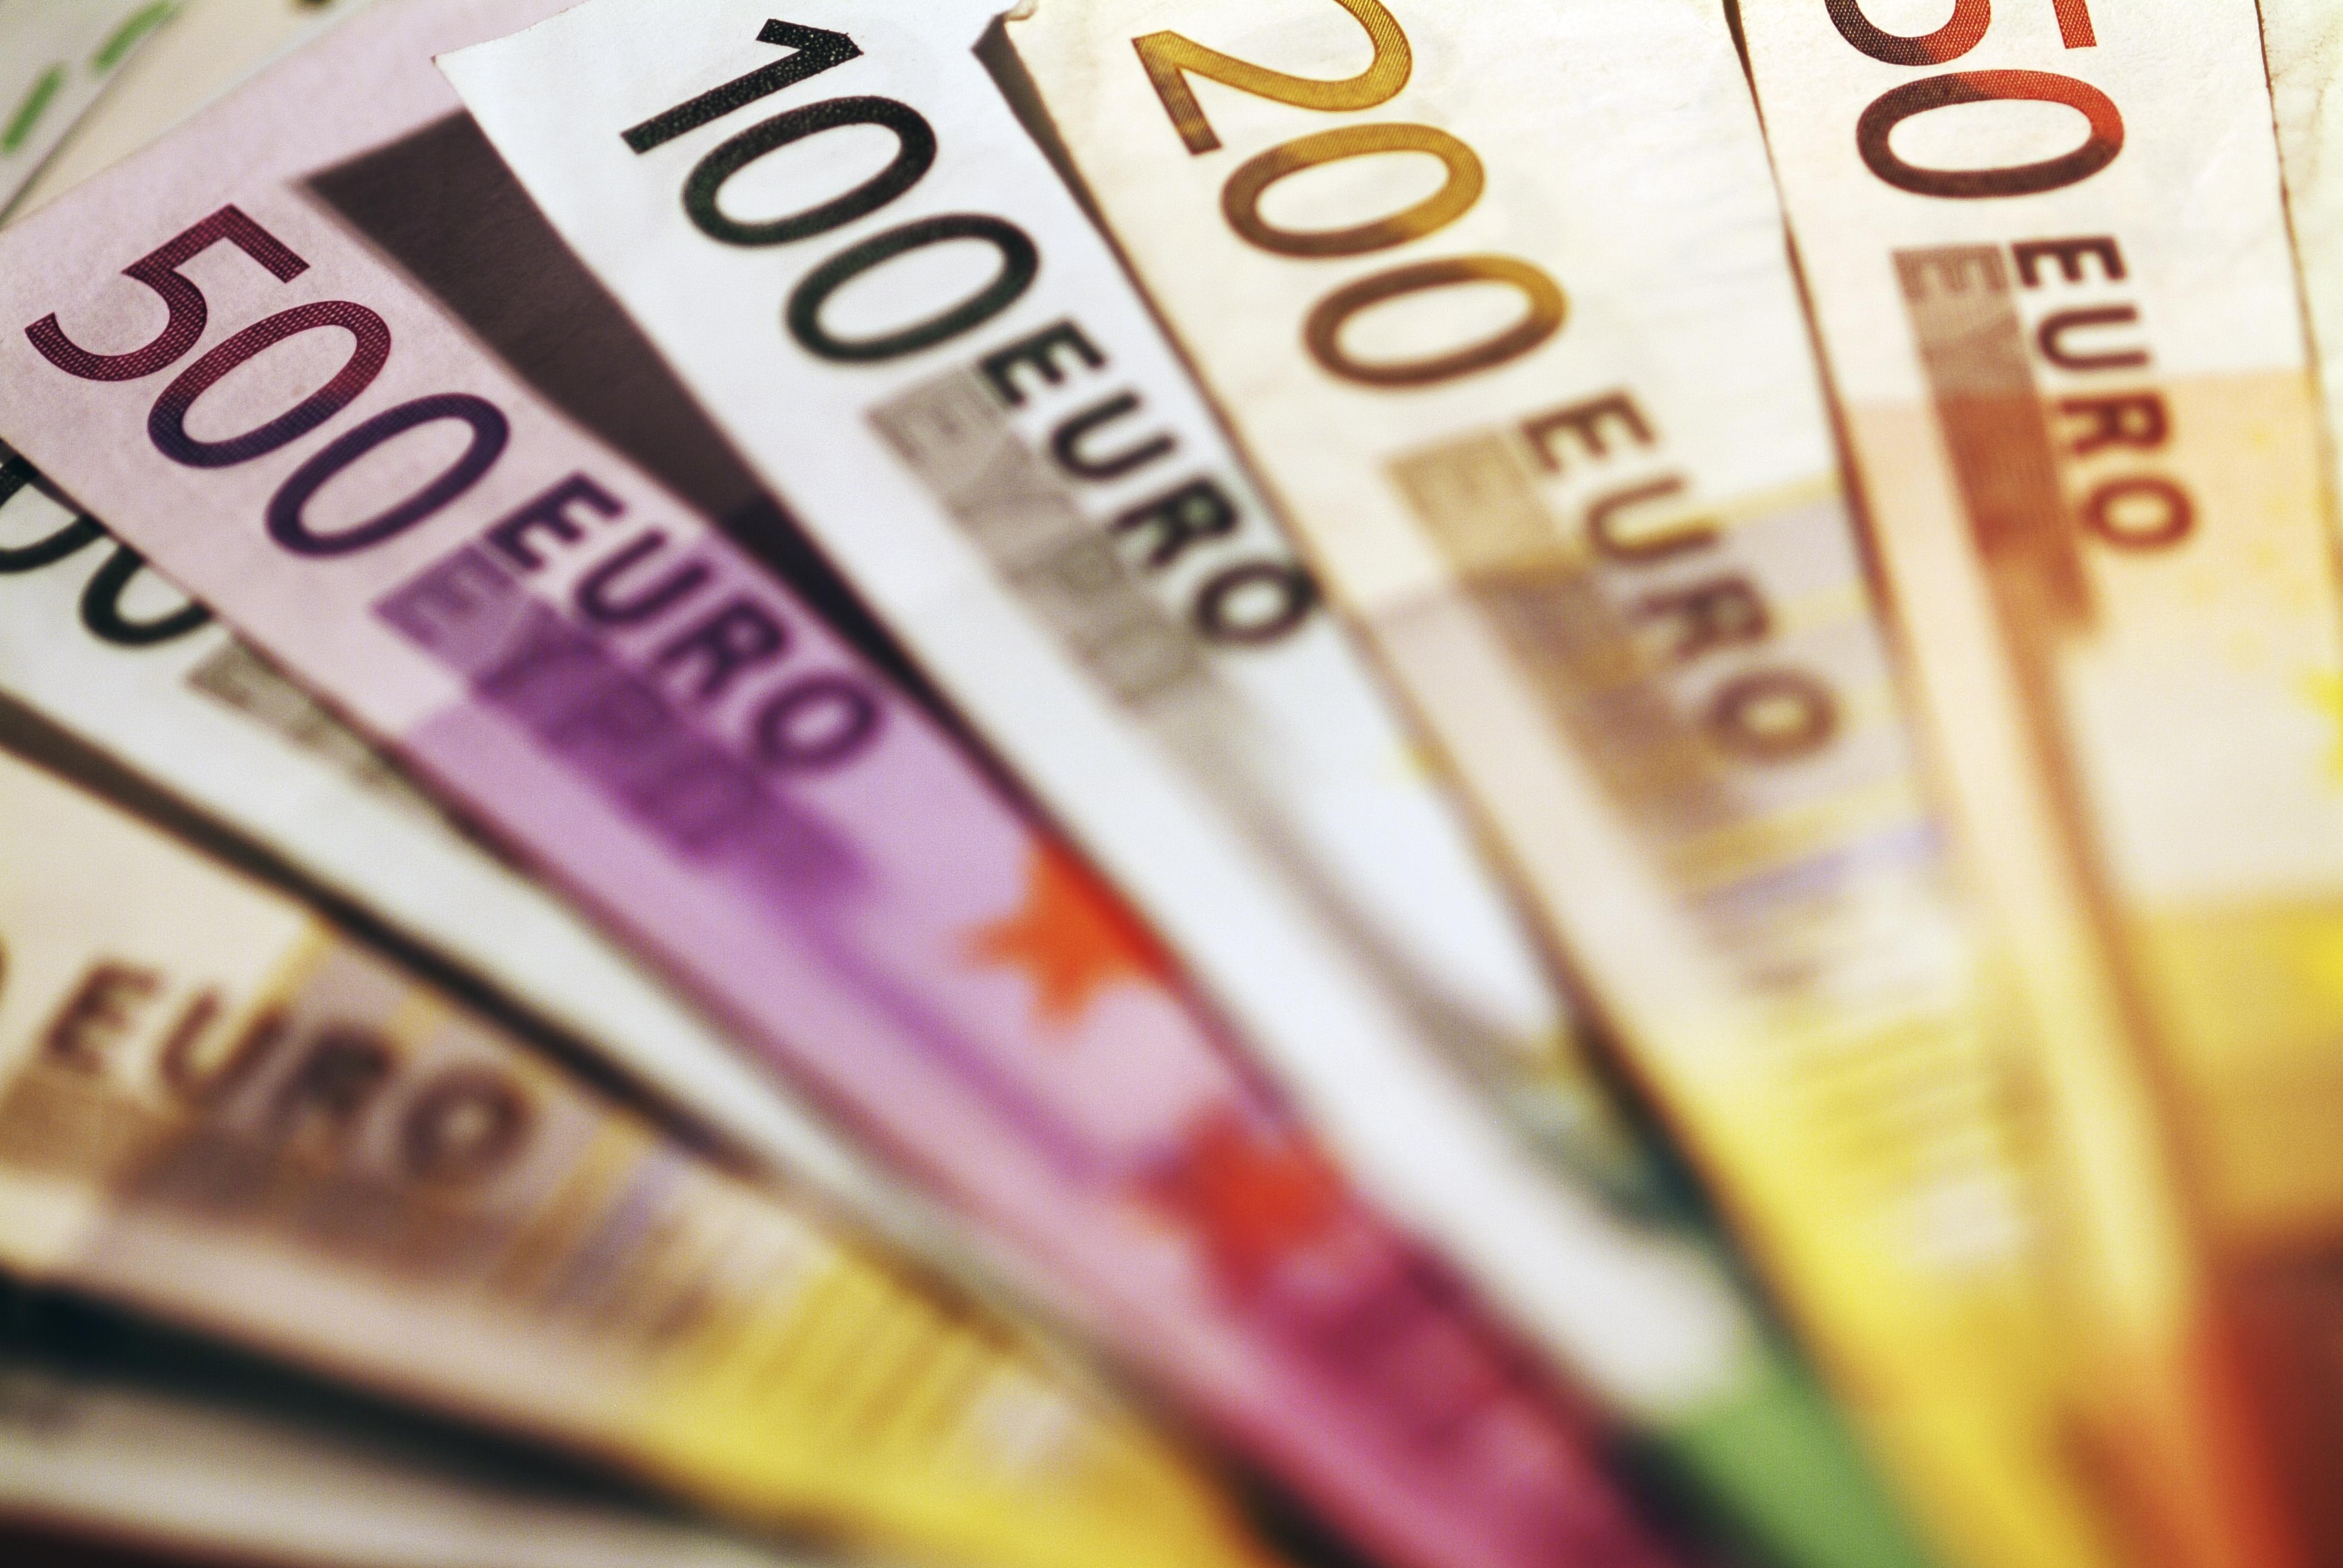 ODDIH: Greece draws 1.14 billion euros from six-month Treasury bills | tovima.gr